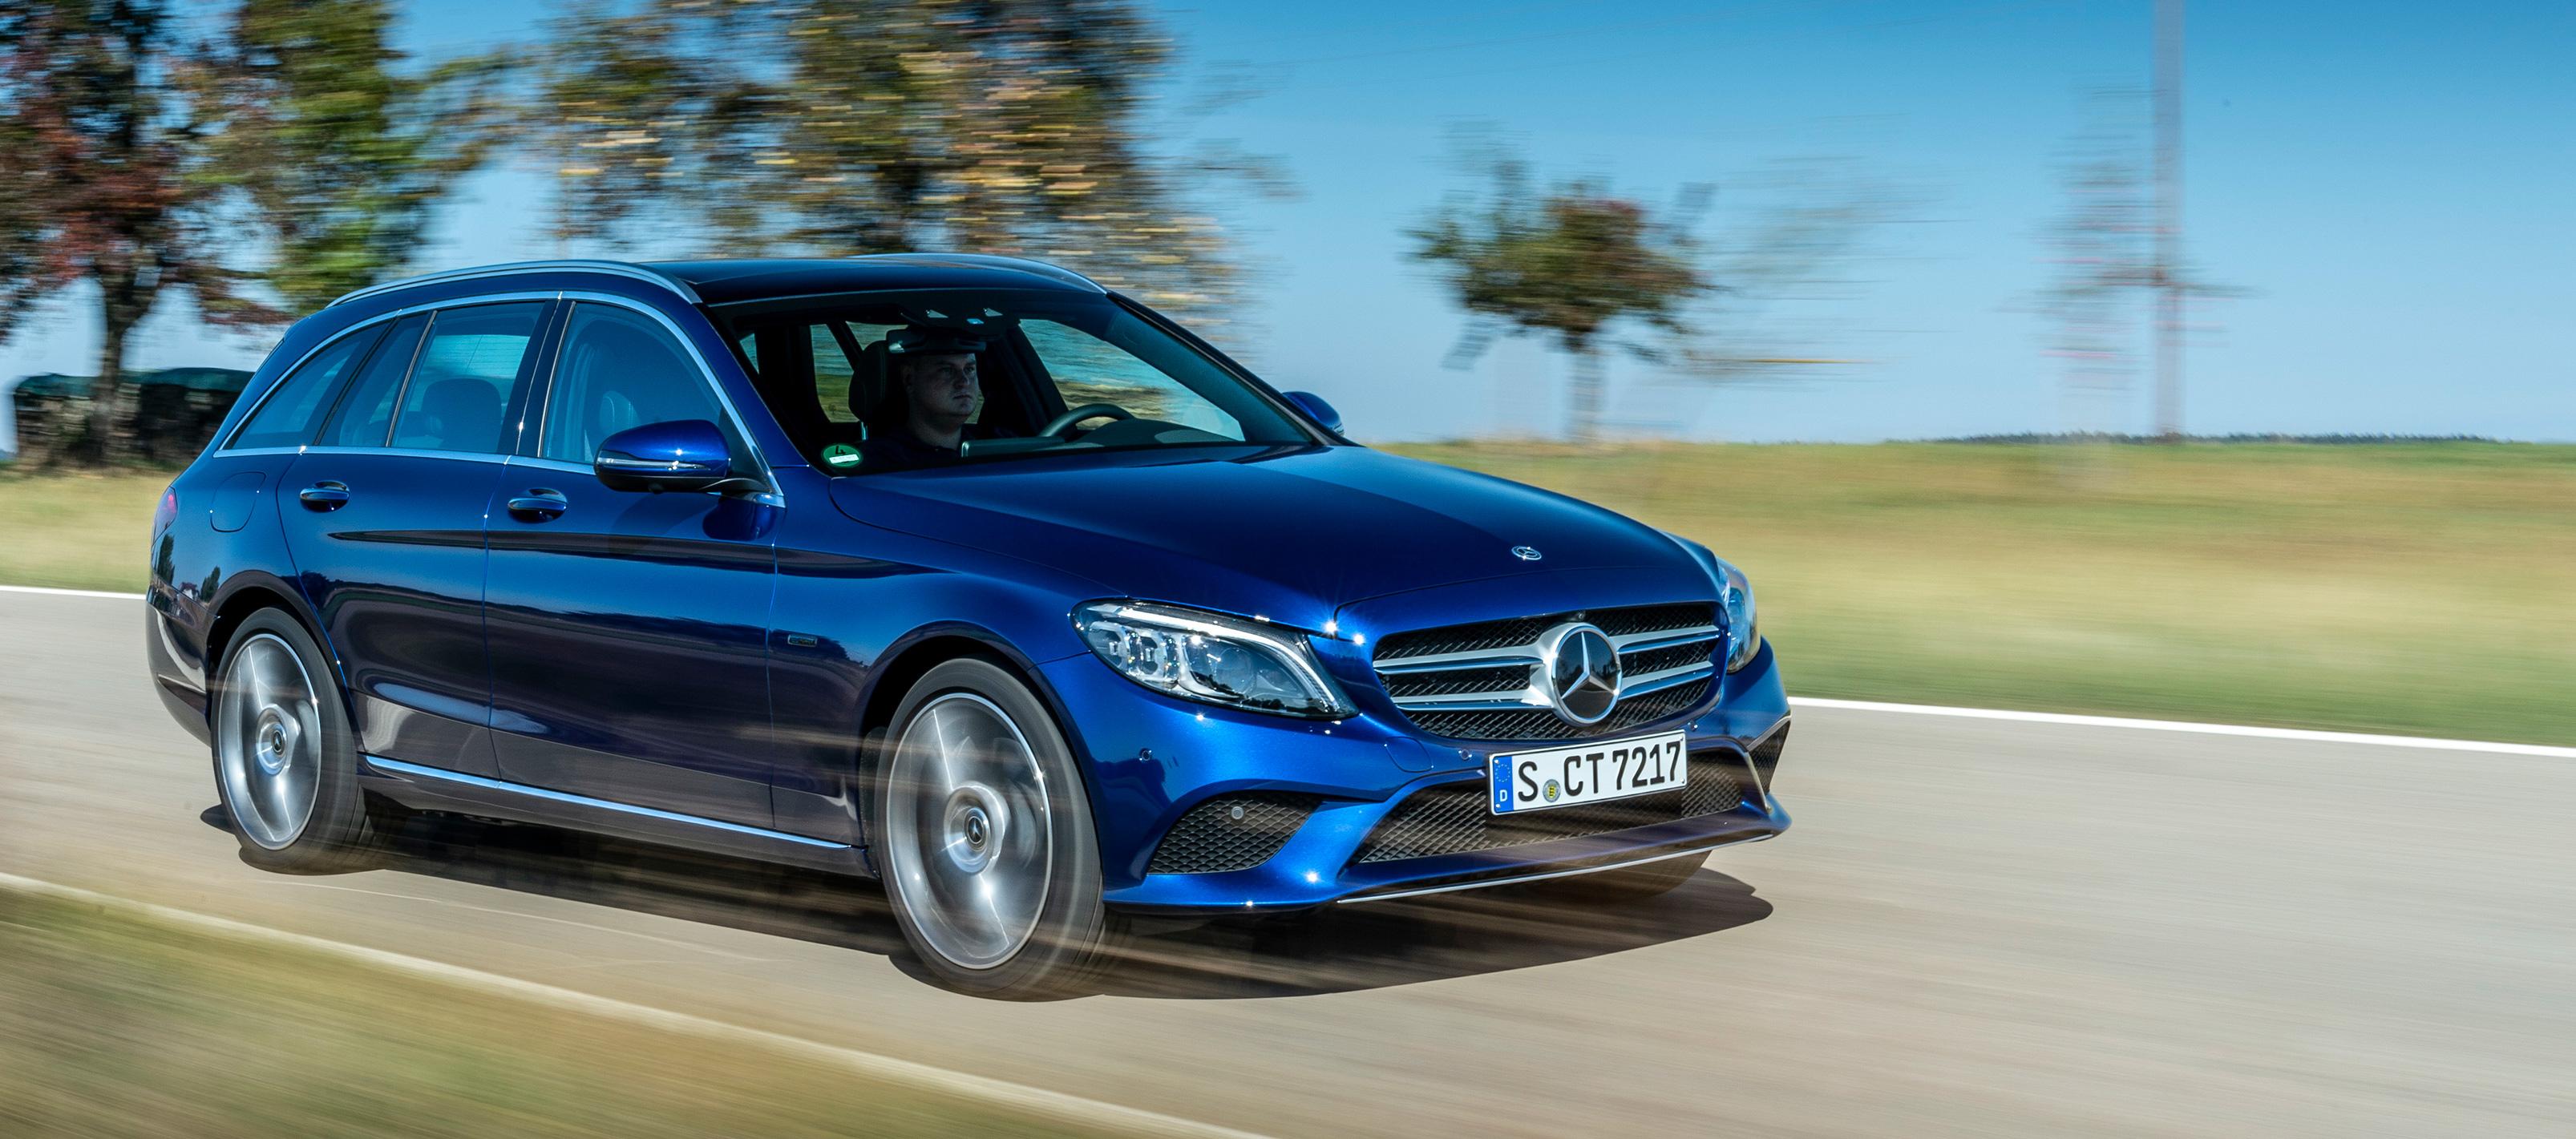 Mercedes-Benz C 300 DE ya disponible en el mercado